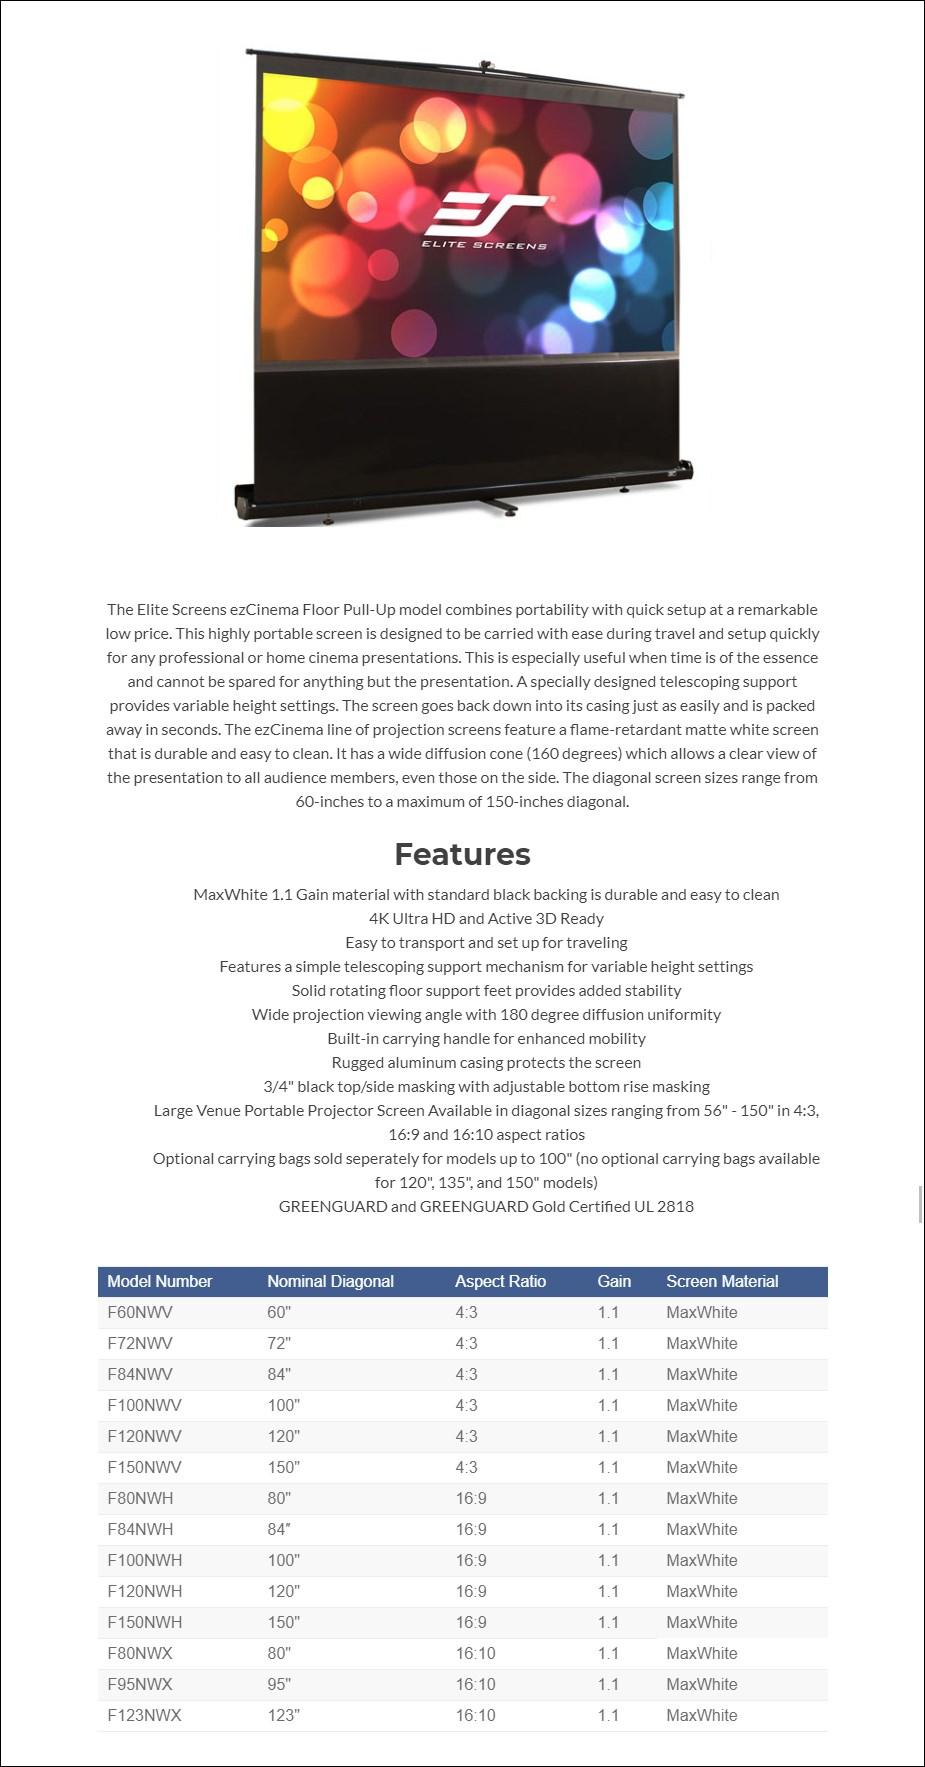 elite-screens-ezcinema-60-43-floor-pullup-projection-screen-ac30909-1-13-.jpg